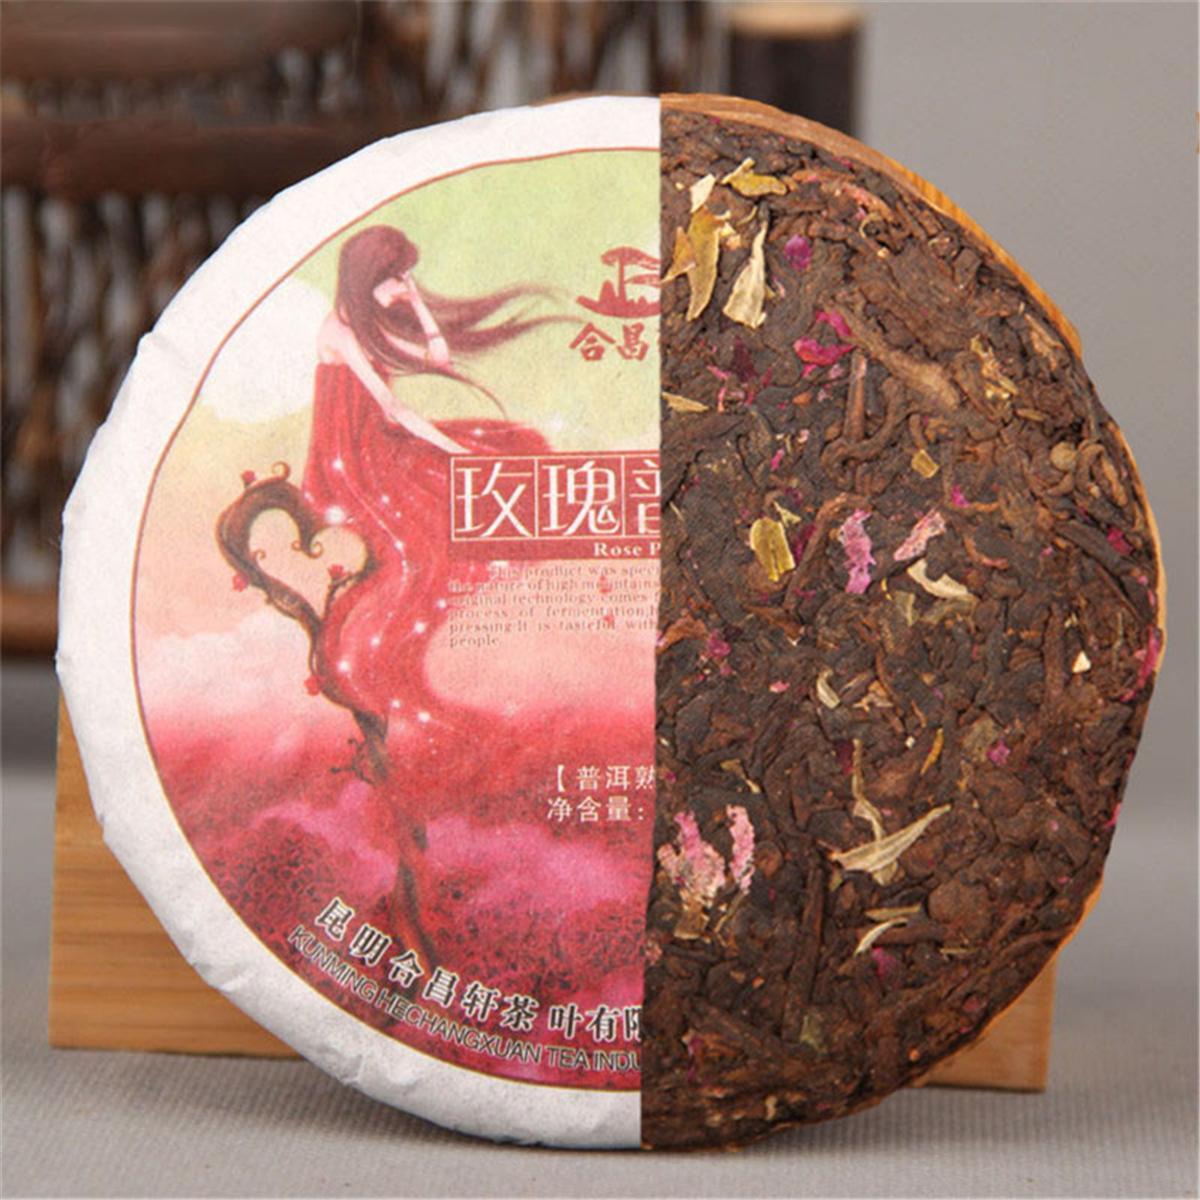 100g china, preparada Sabor Puerh Rose té maduro rojo Puer Puer erh del alimento verde de alimentos saludables Puer Té Negro